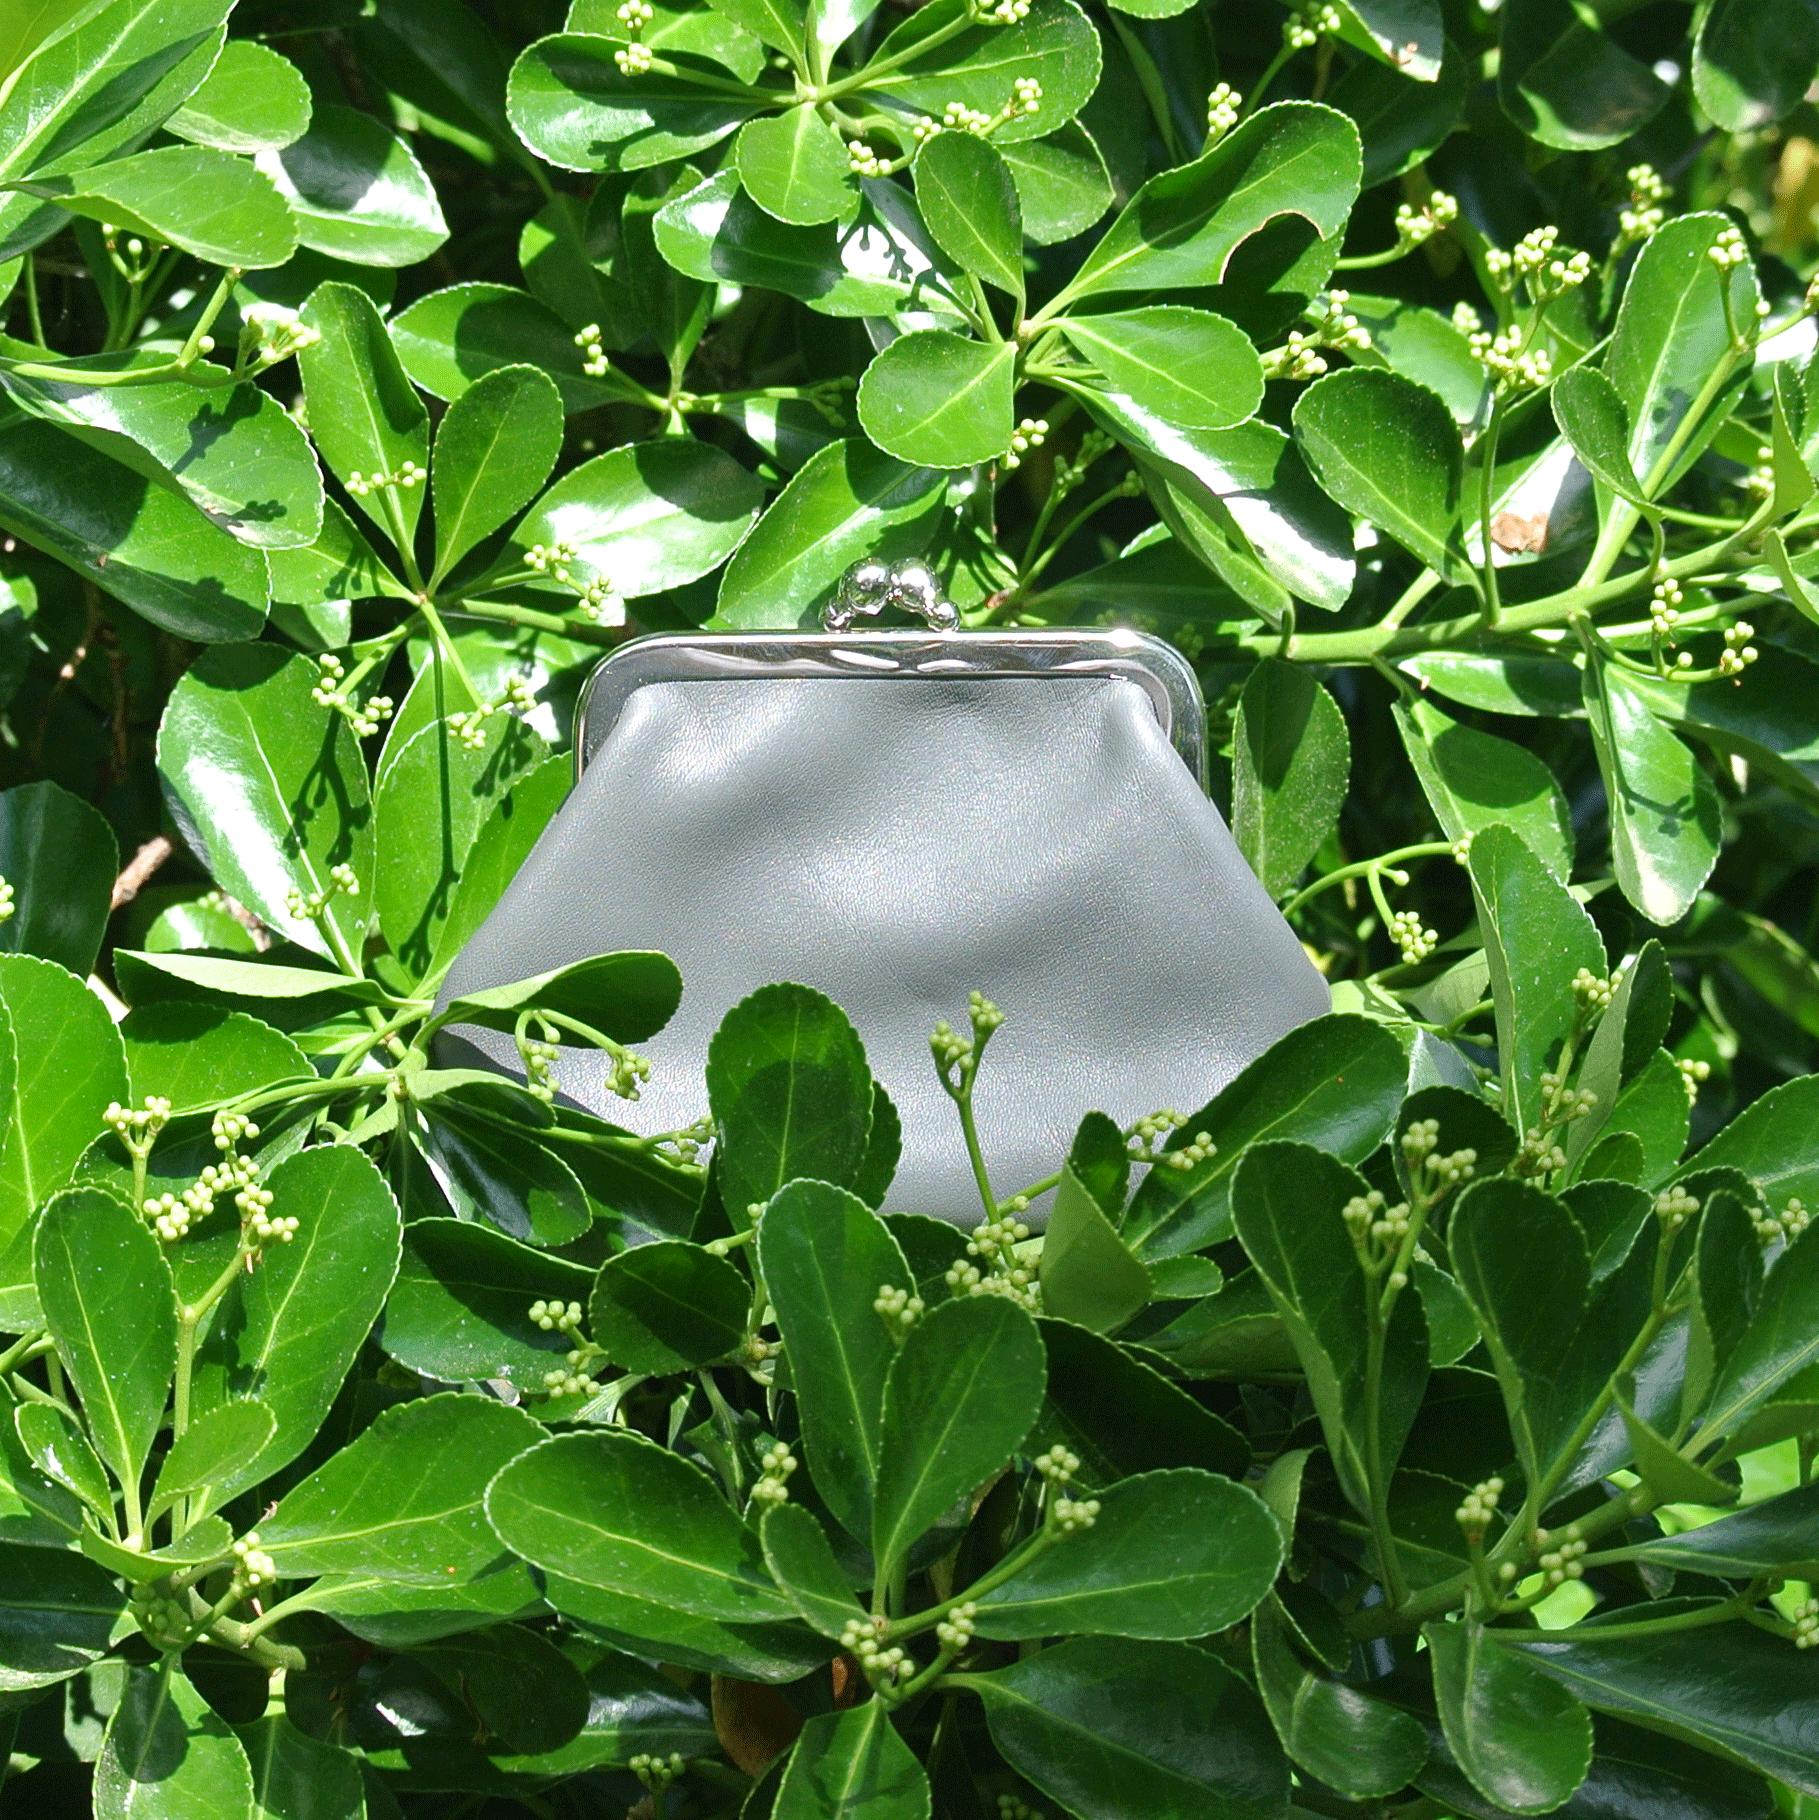 la-cartabliere-fabrique-en-france-made-in-france-porte-monnaie-reine-en-cuir-nappa-gris